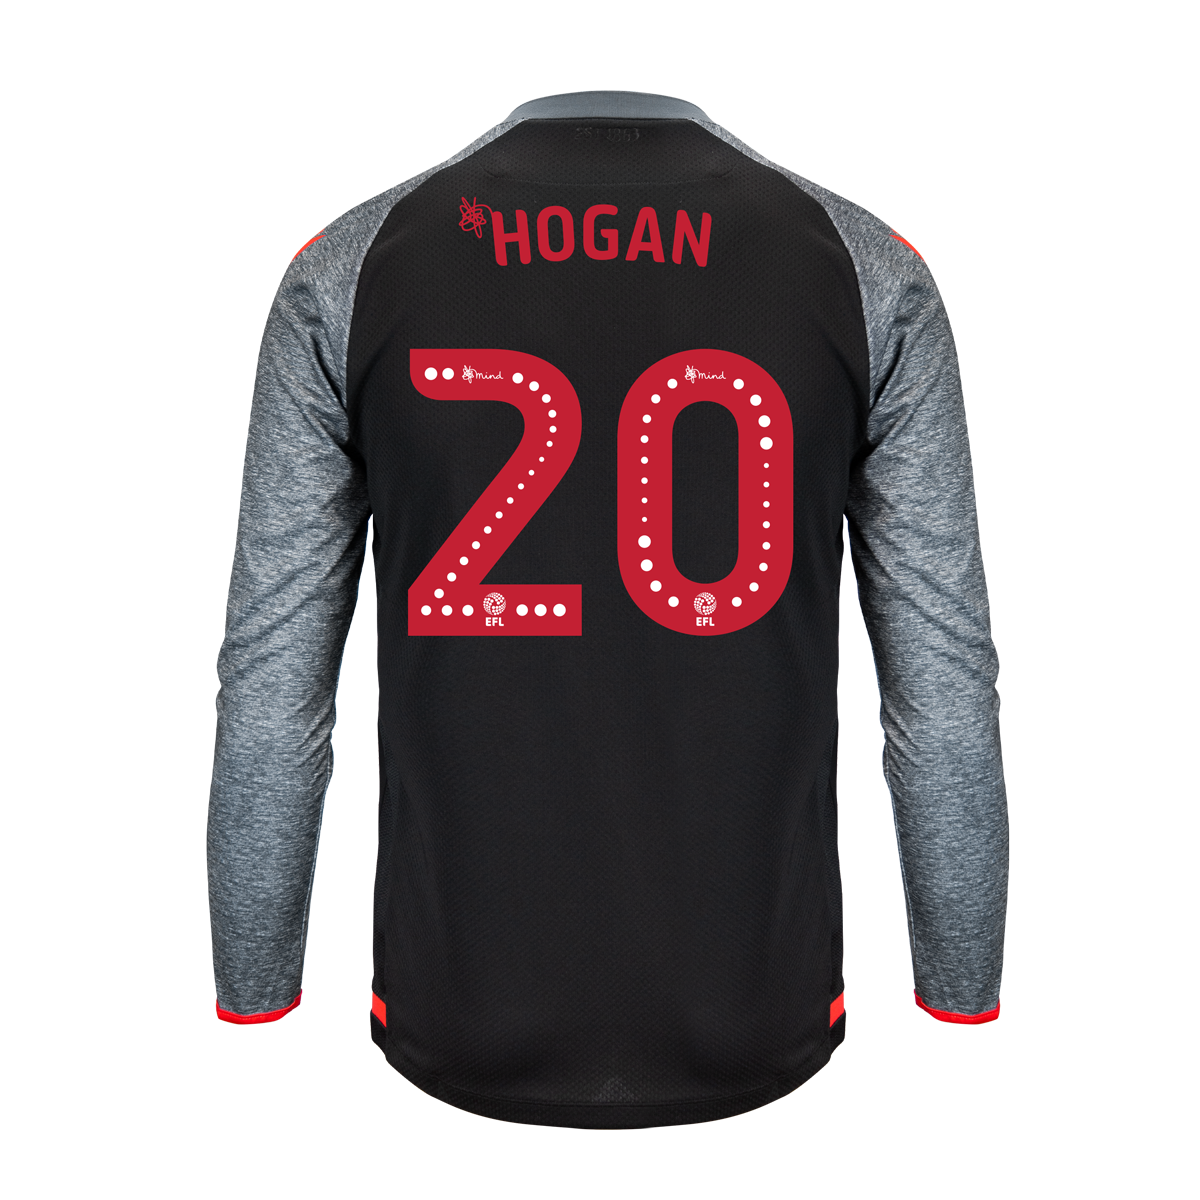 2019/20 Junior Away LS Shirt - Hogan